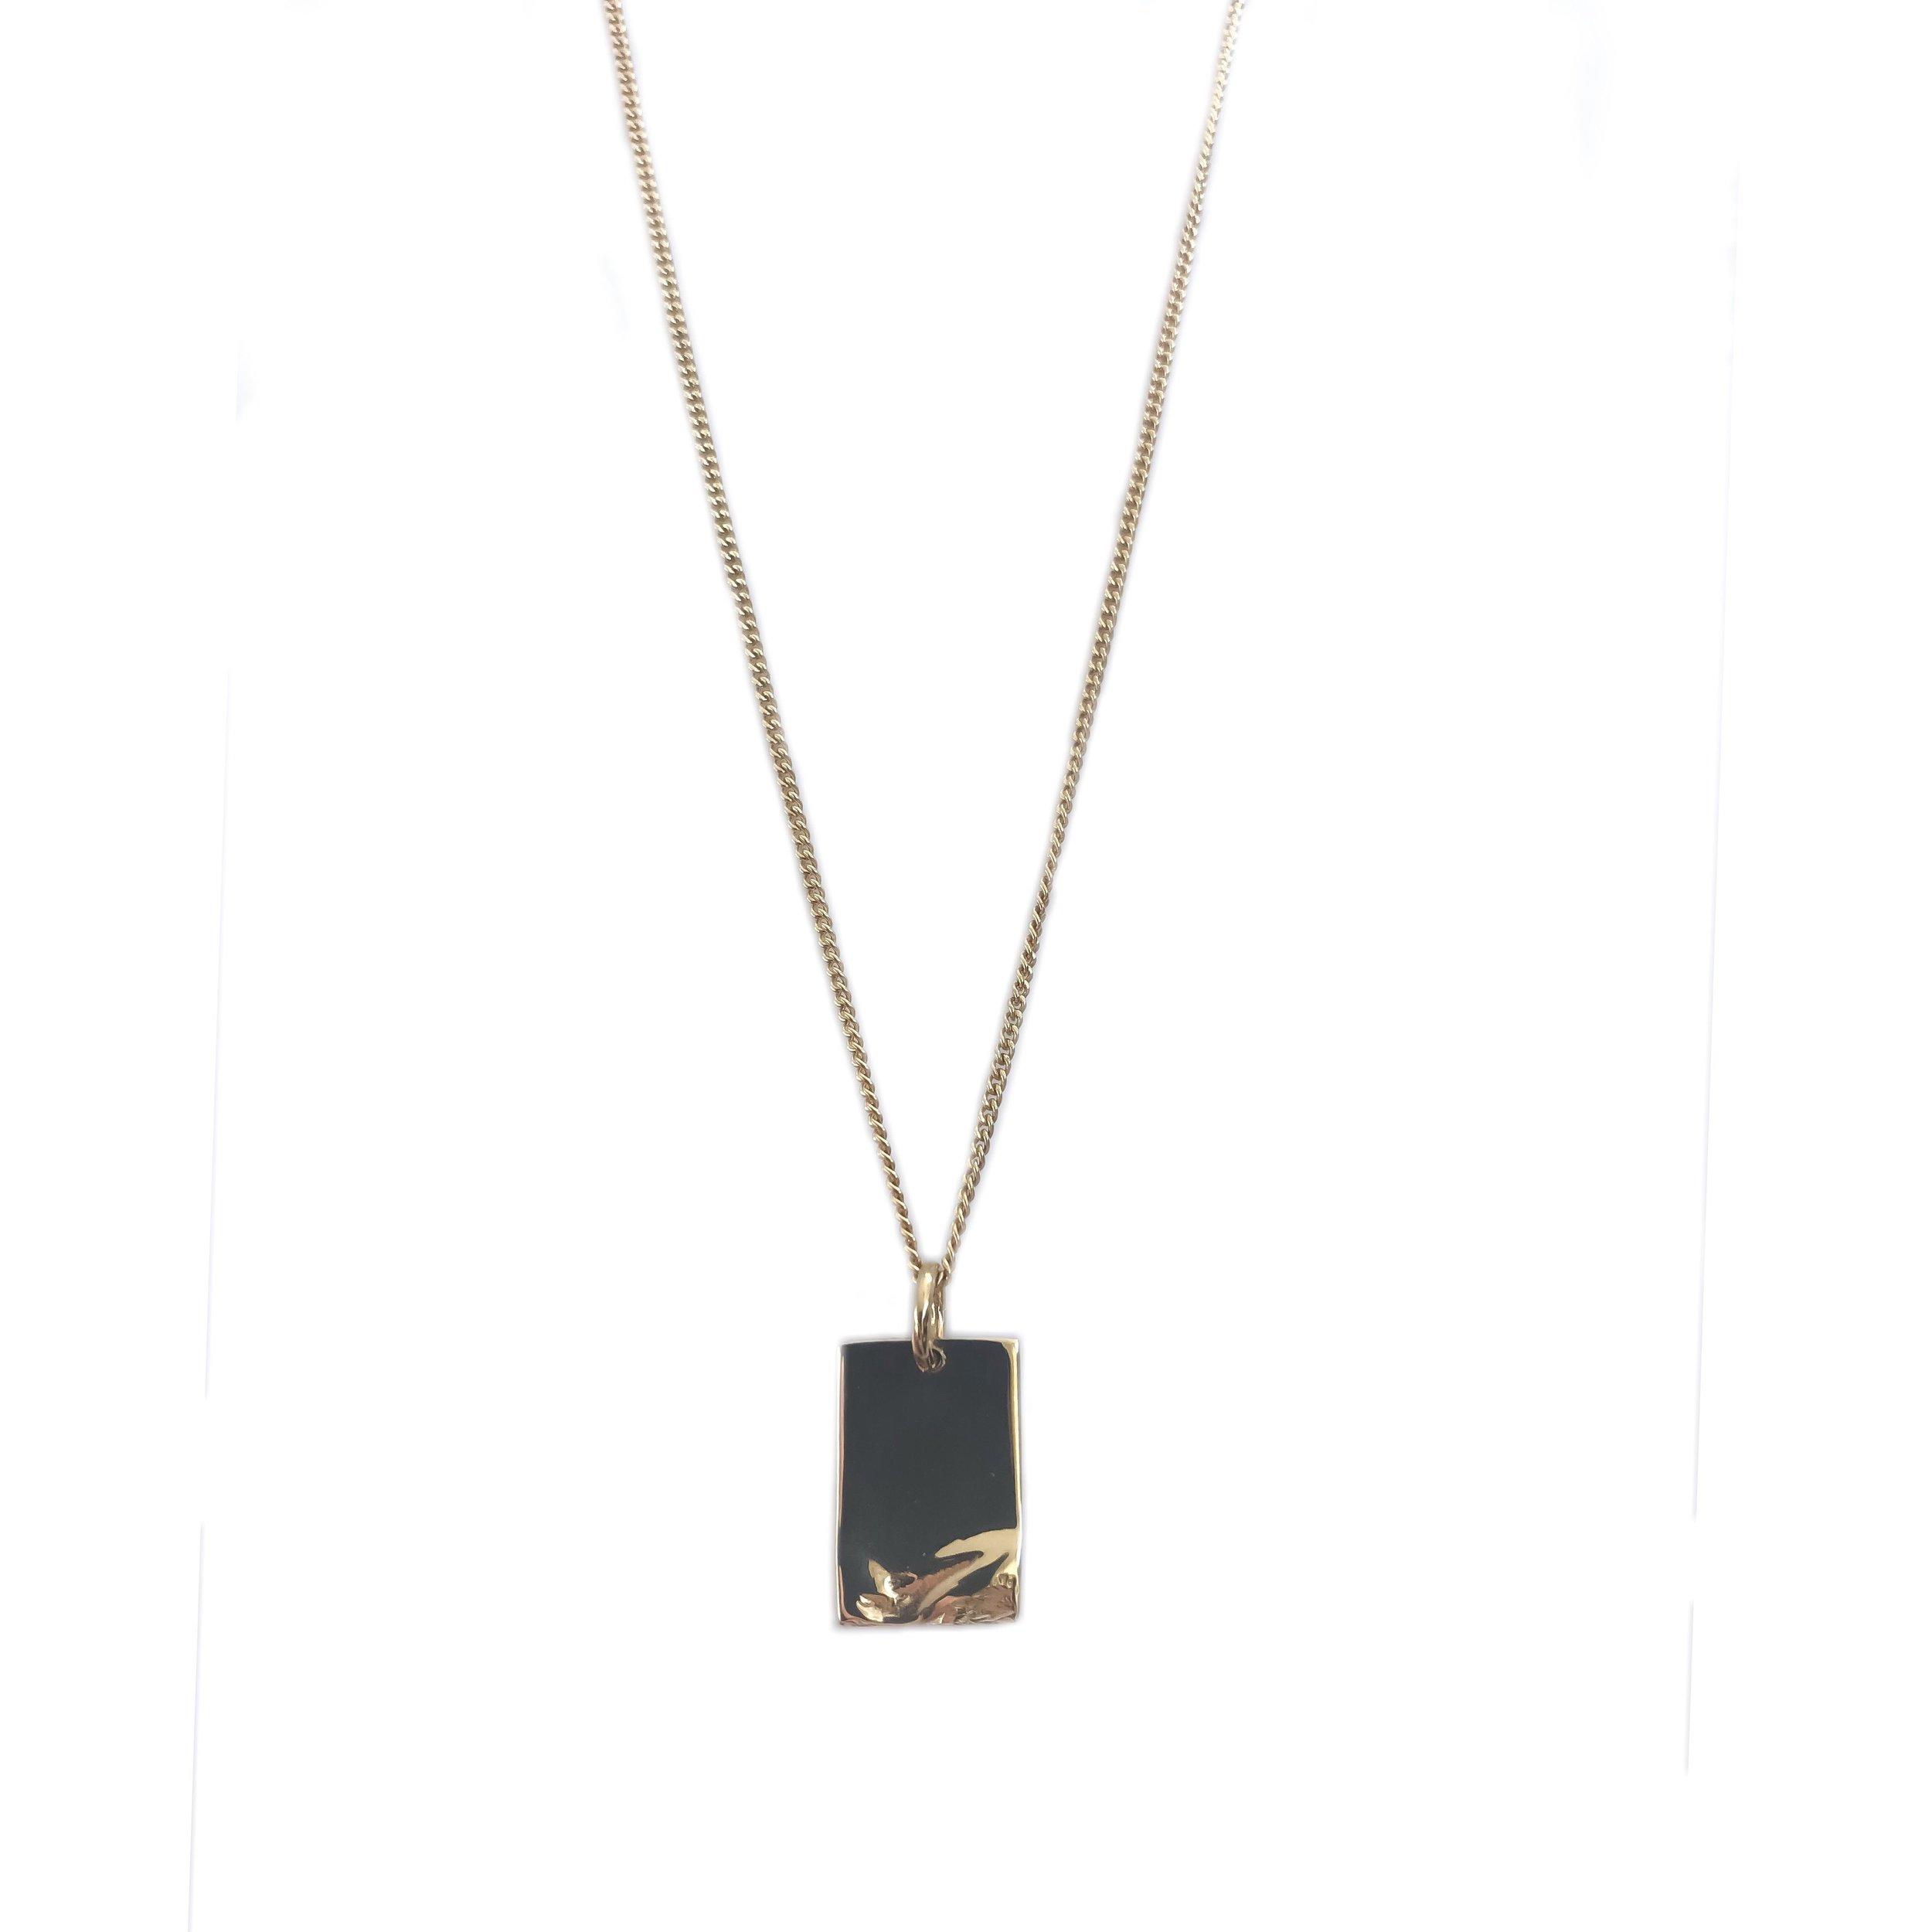 molten rectangle pendant - product shot.jpeg